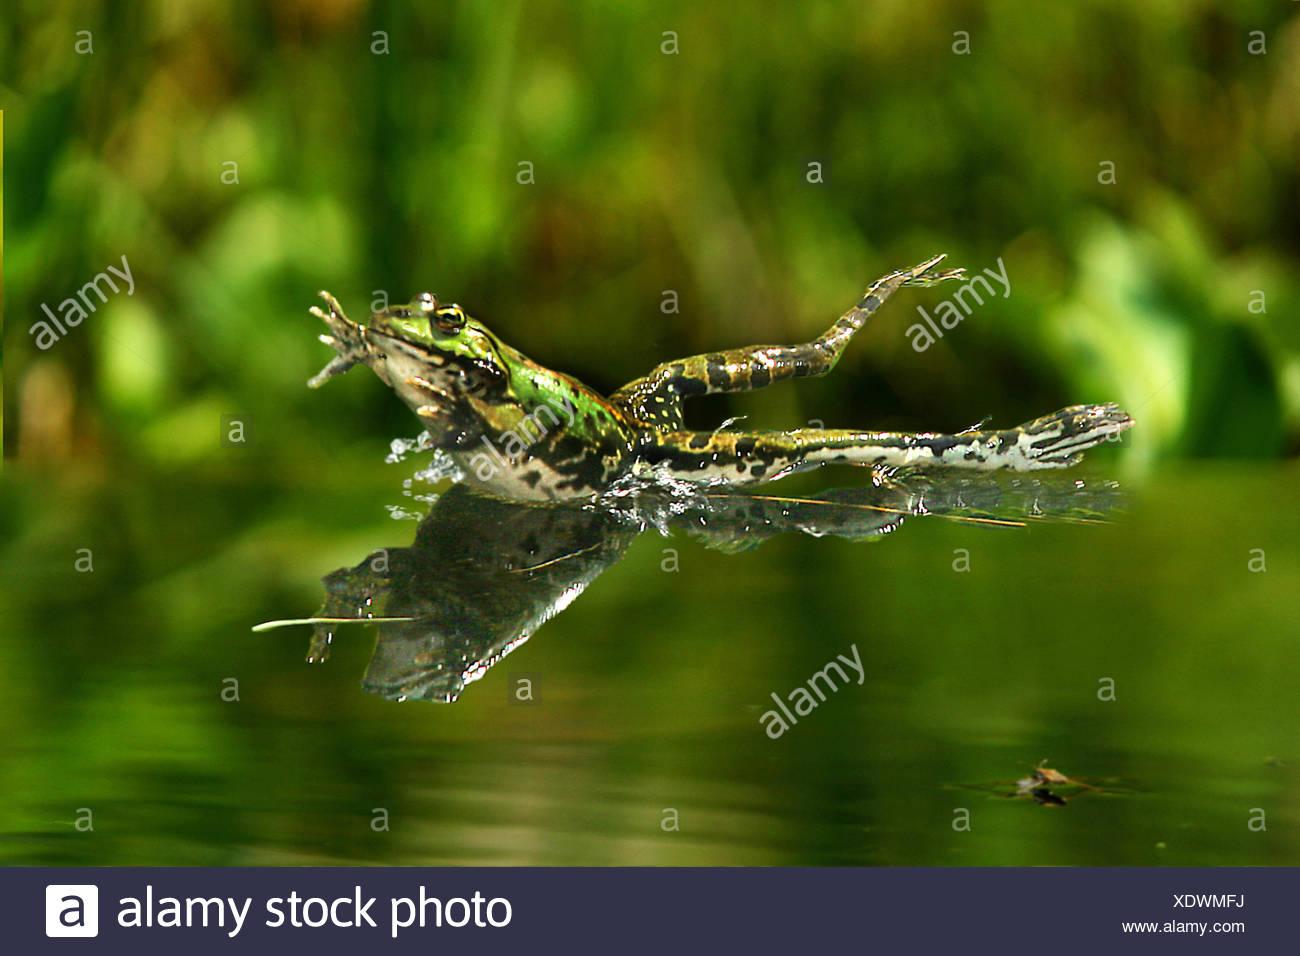 European edible frog, common edible frog (Rana kl. esculenta, Rana esculenta, Pelophylax esculentus), jumping into water, Germany - Stock Image